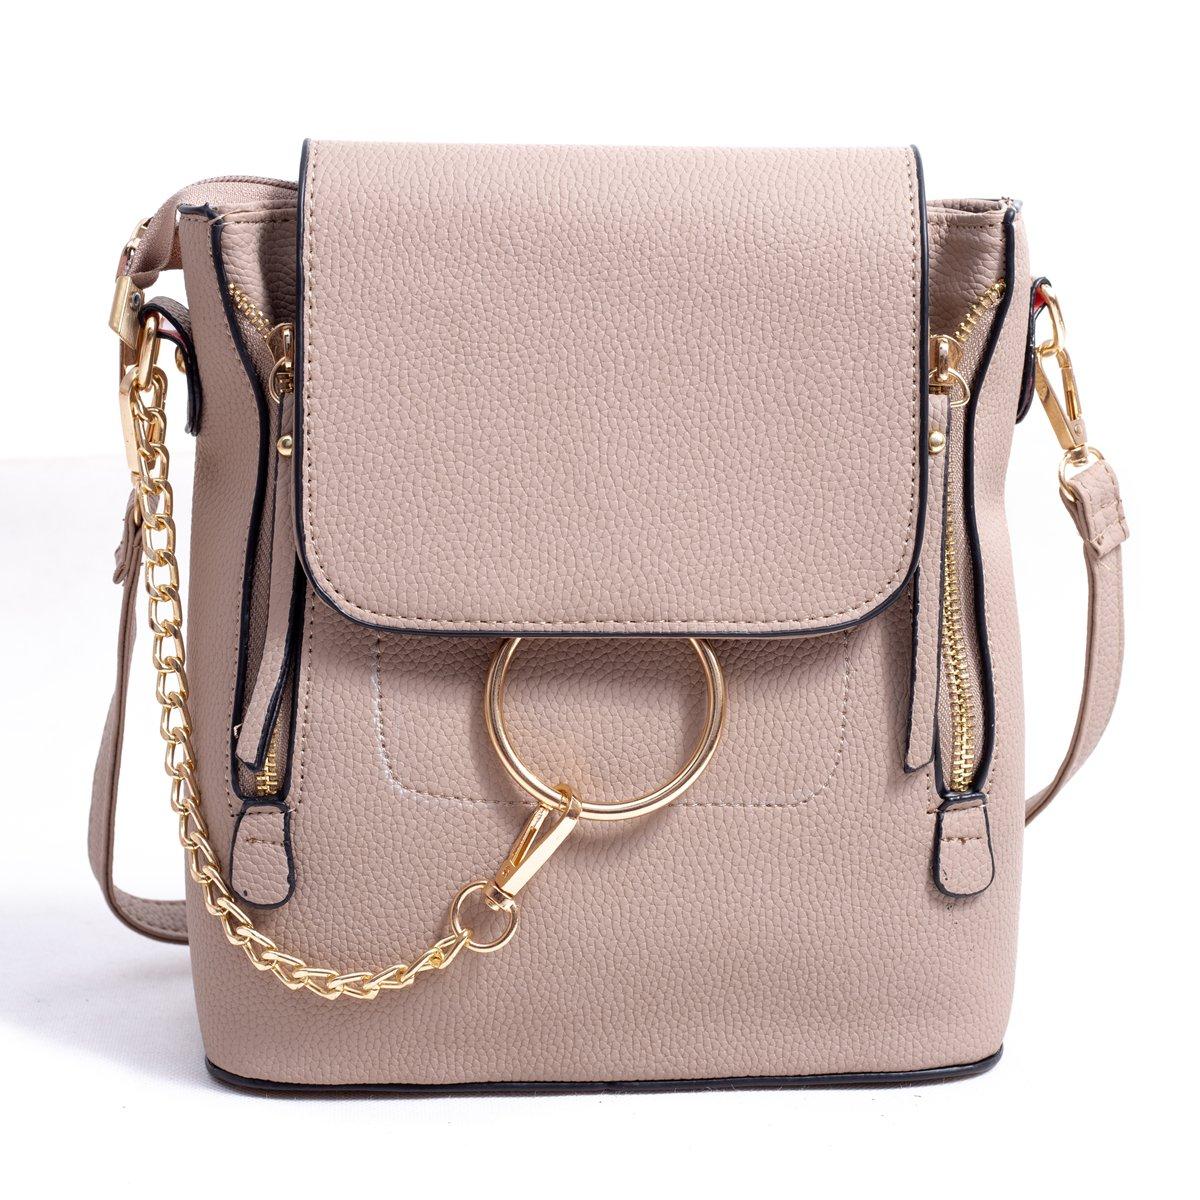 BABORRY Women Crossbody Chain Backpack Purse Small Pu Designer Leather Shoulder Bag for women Ladies Brown Handbags (Khaki)